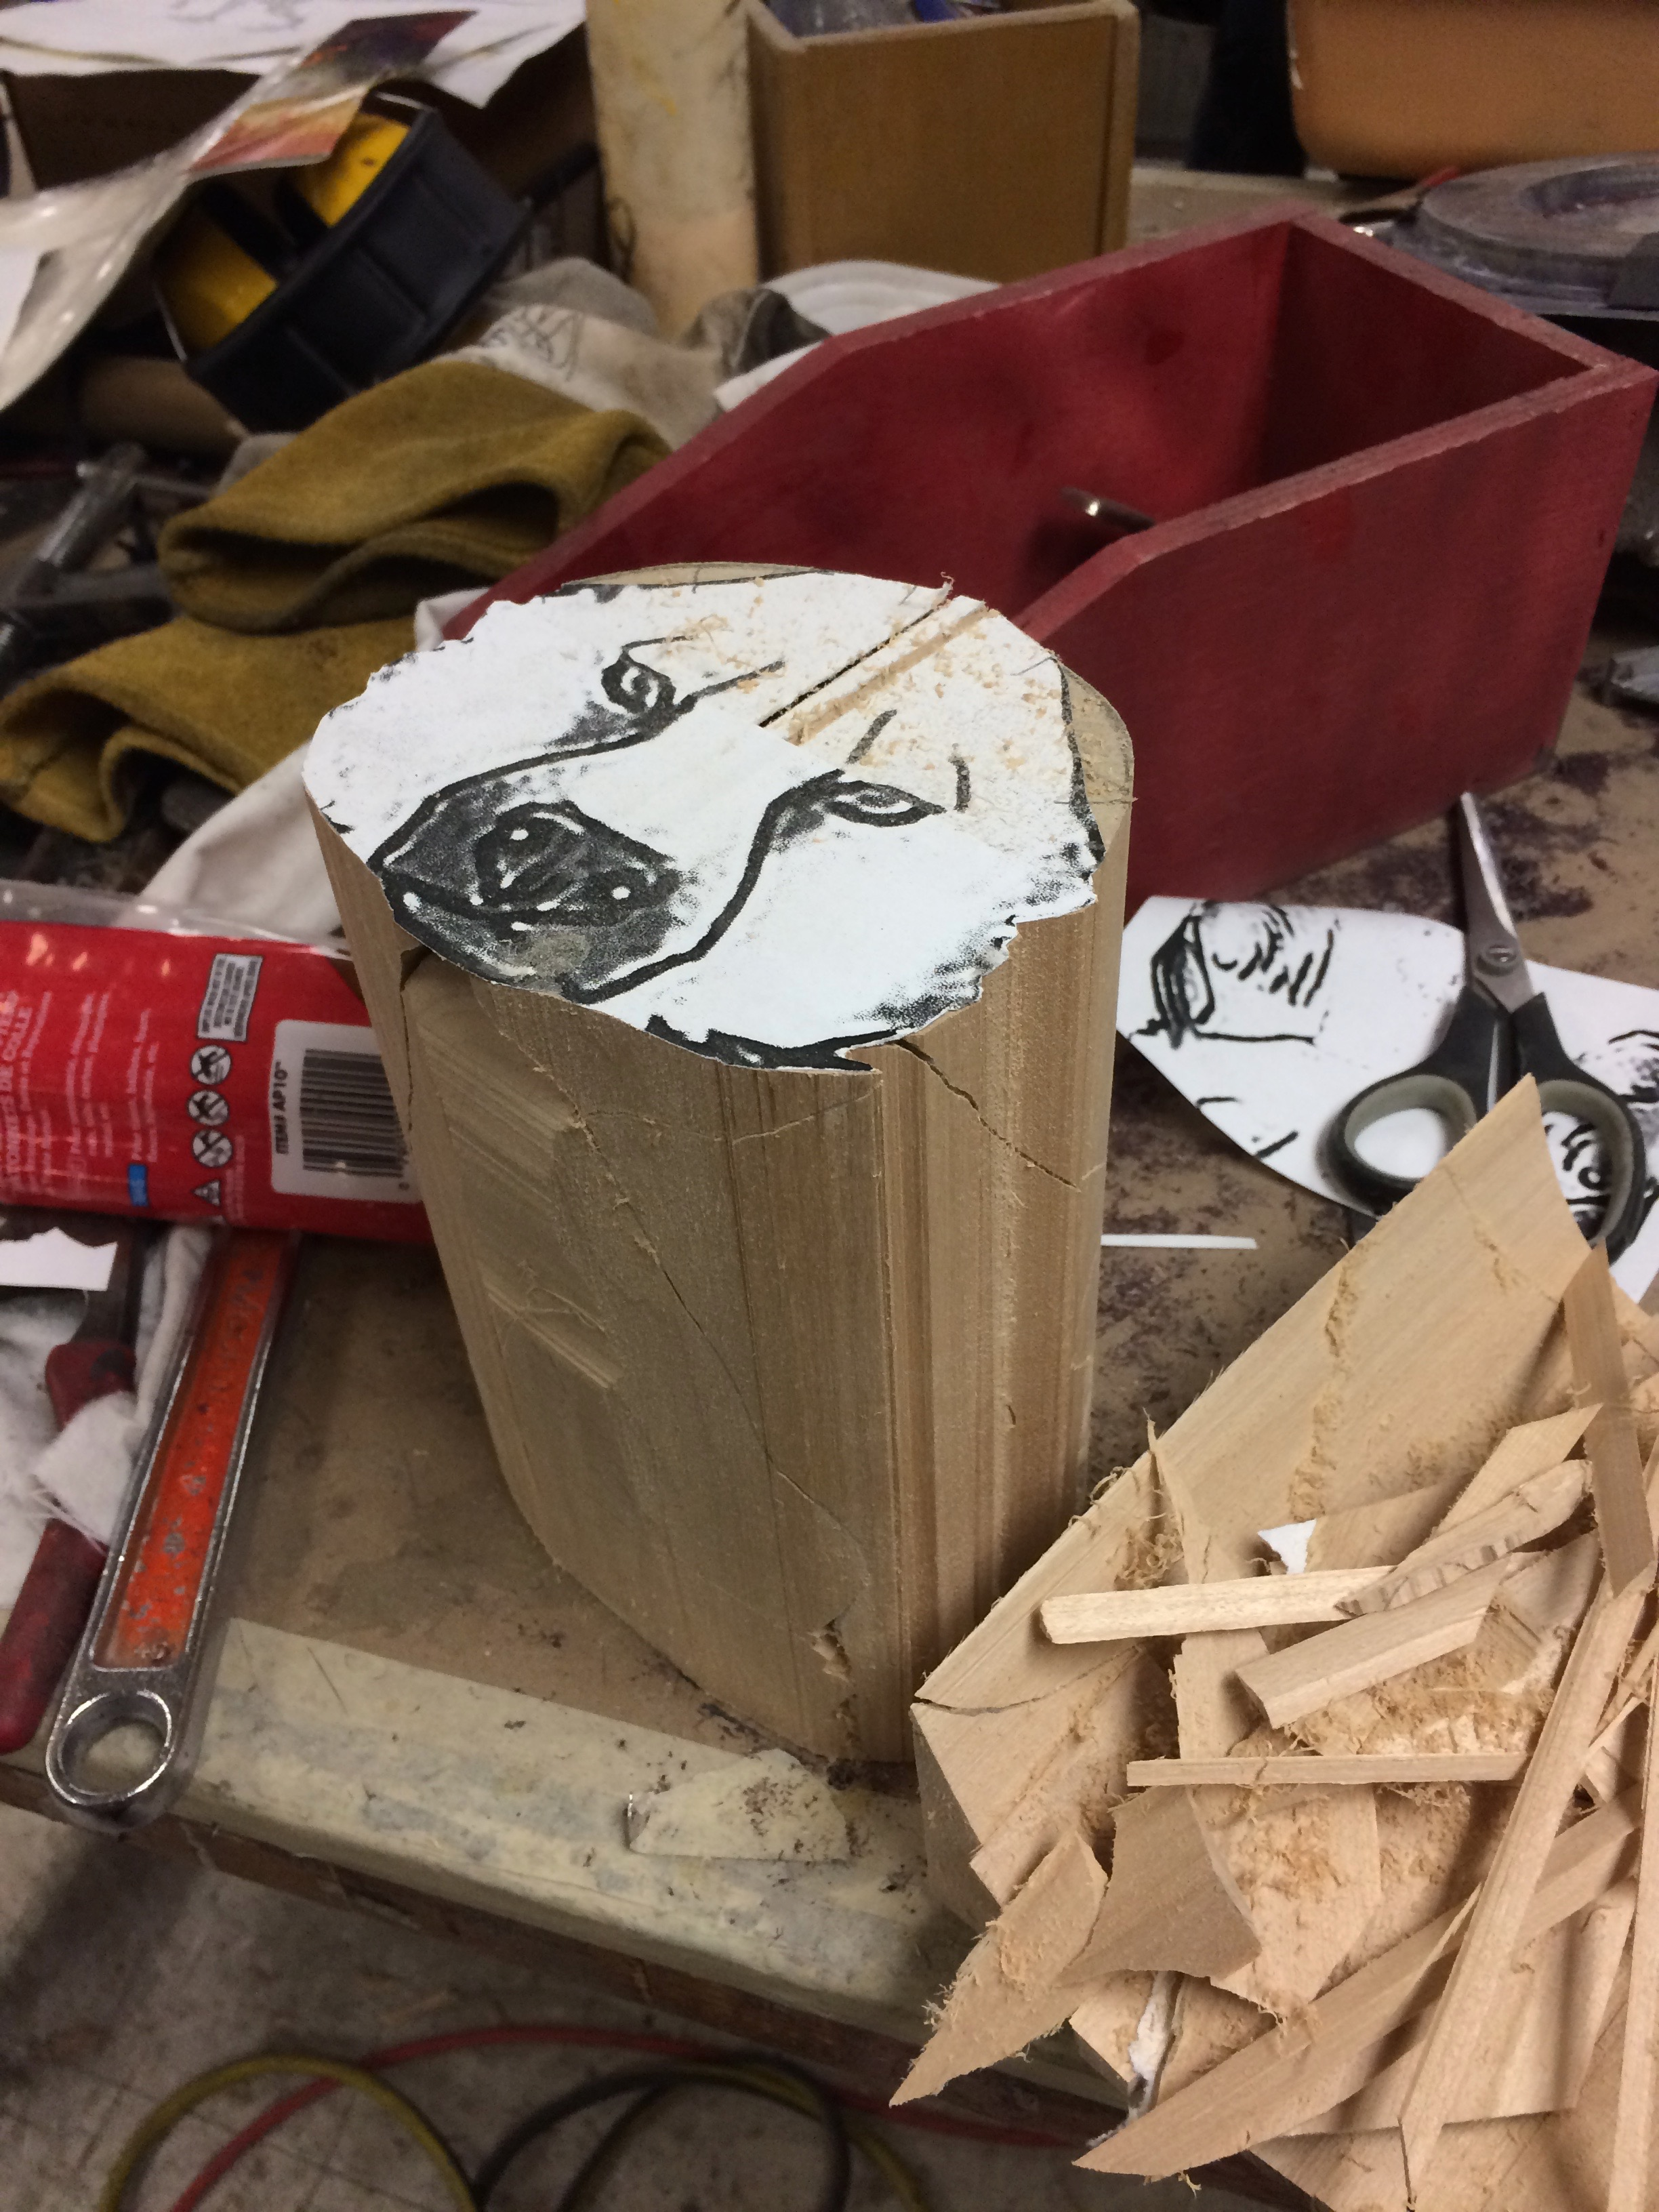 Bass wood head band saw cuts